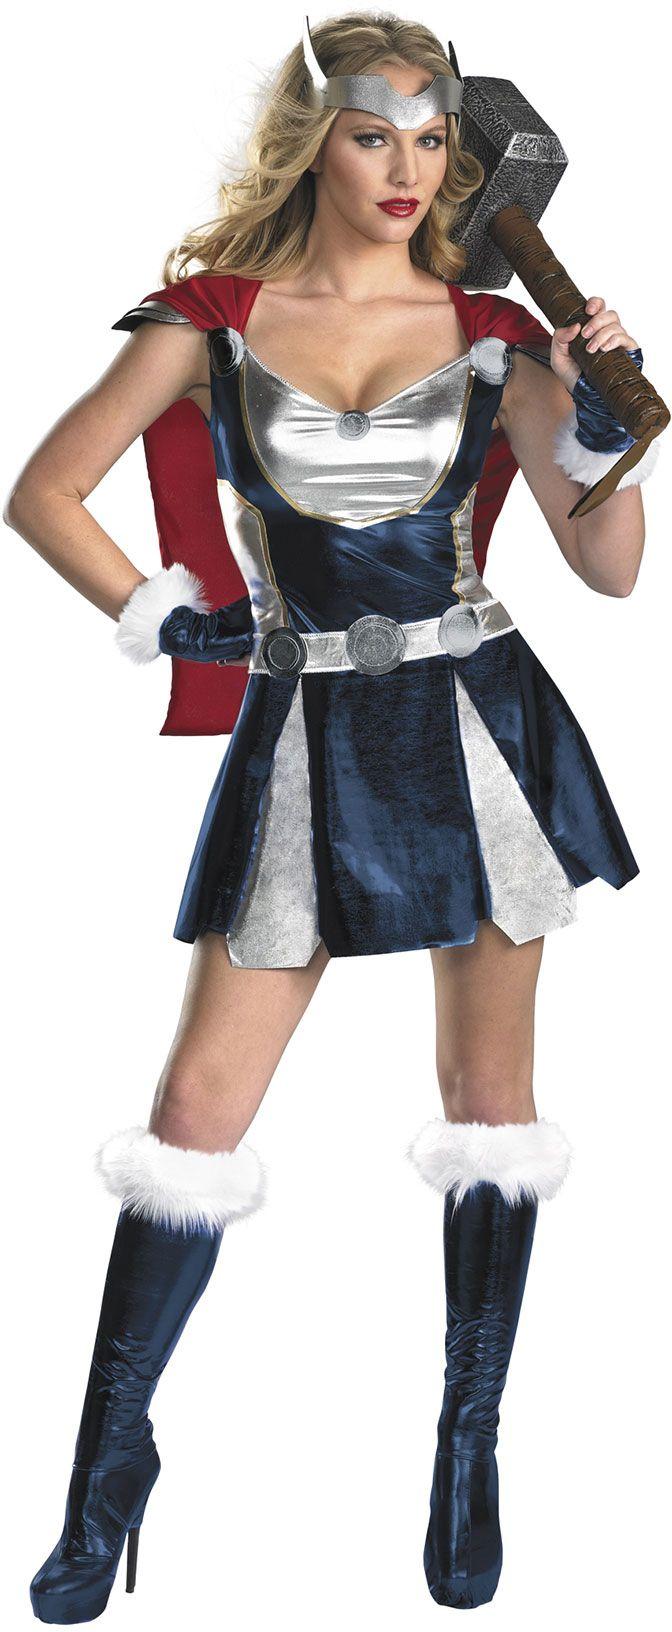 Girl Pirate Costume http://greathalloweencostumes.org/